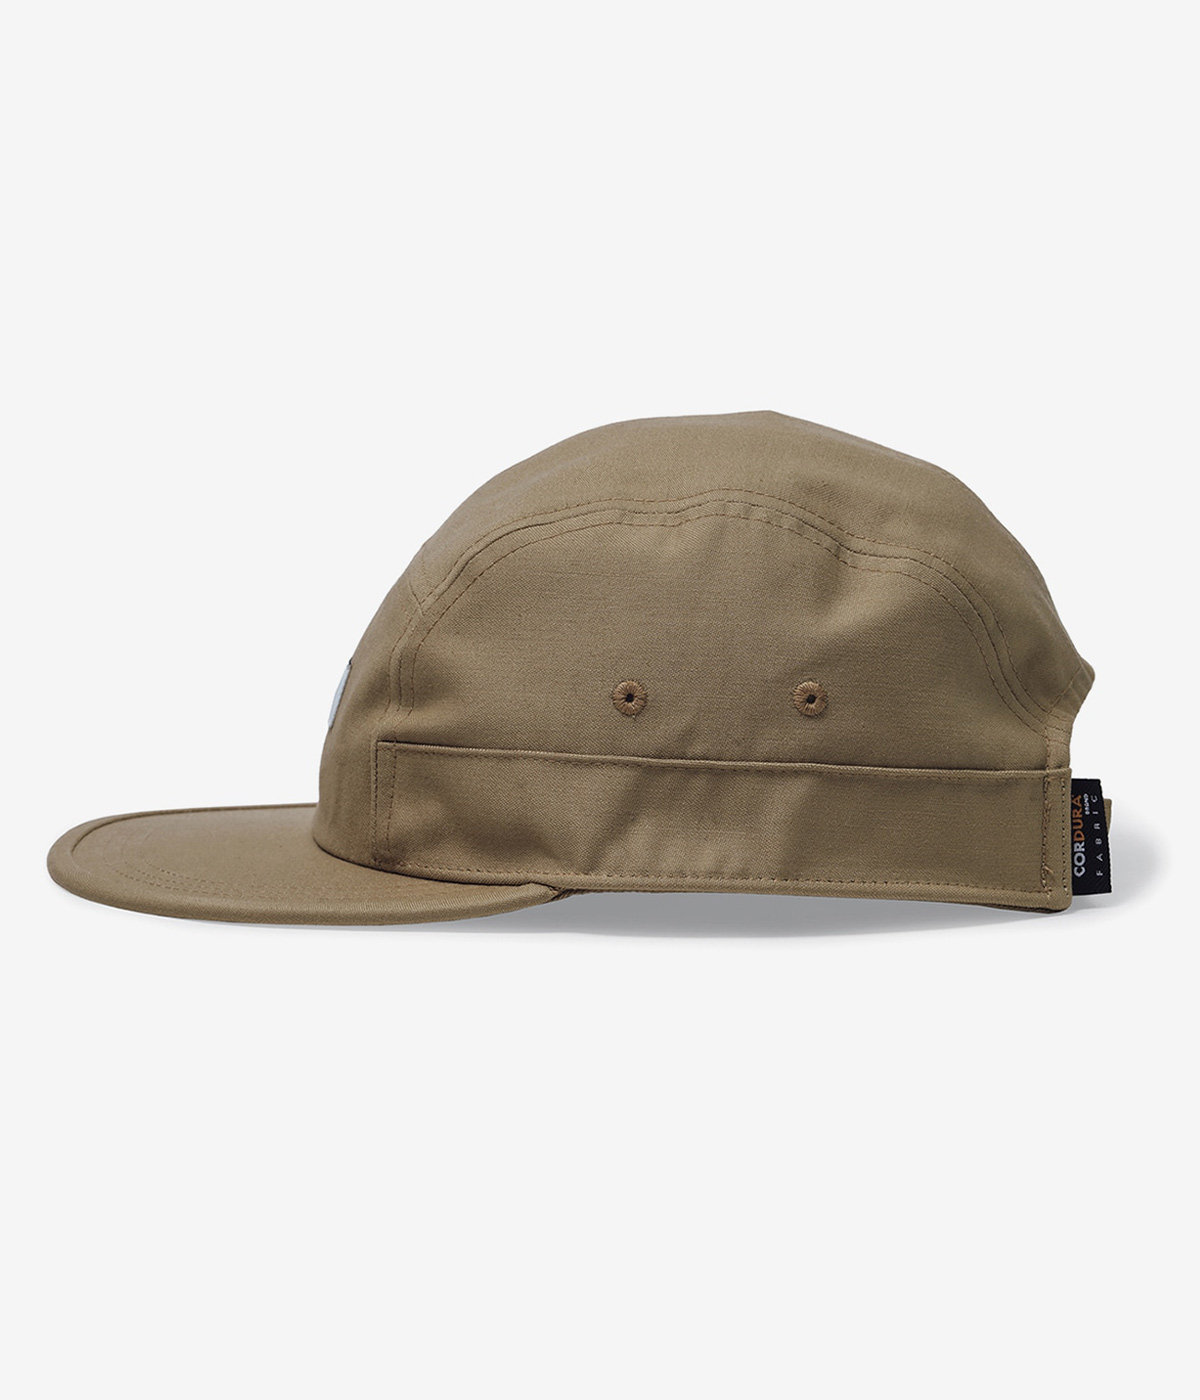 T-7 01 / CAP / NYCO. SATIN. CORDURA